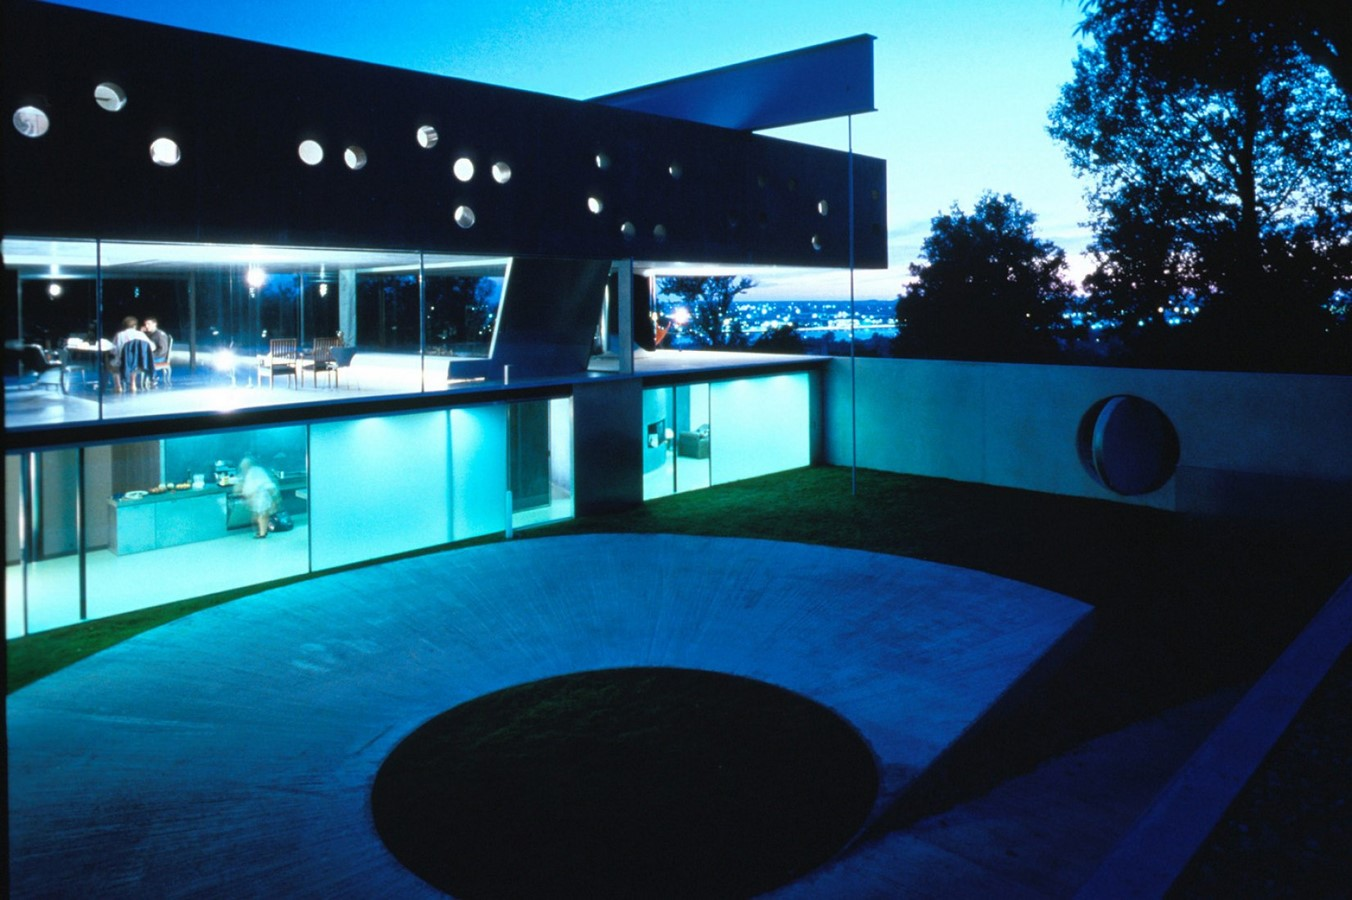 Maison Bordeaux by Rem Koolhaas: The living house - Sheet8